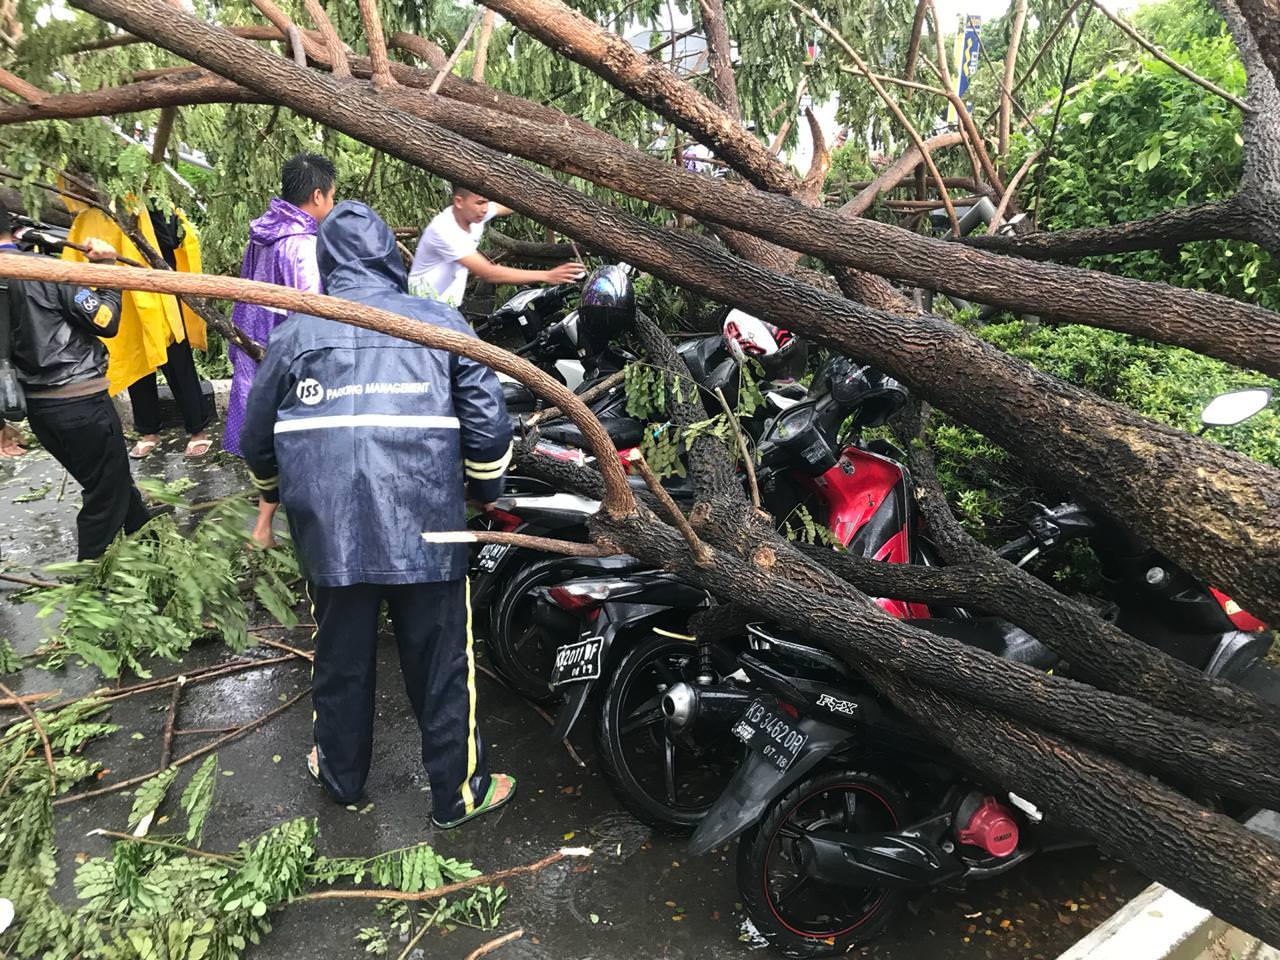 Hujan Ekstrem dan Angin Kencang, Pohon, Baliho Tumbang, Jalan Macet Parah